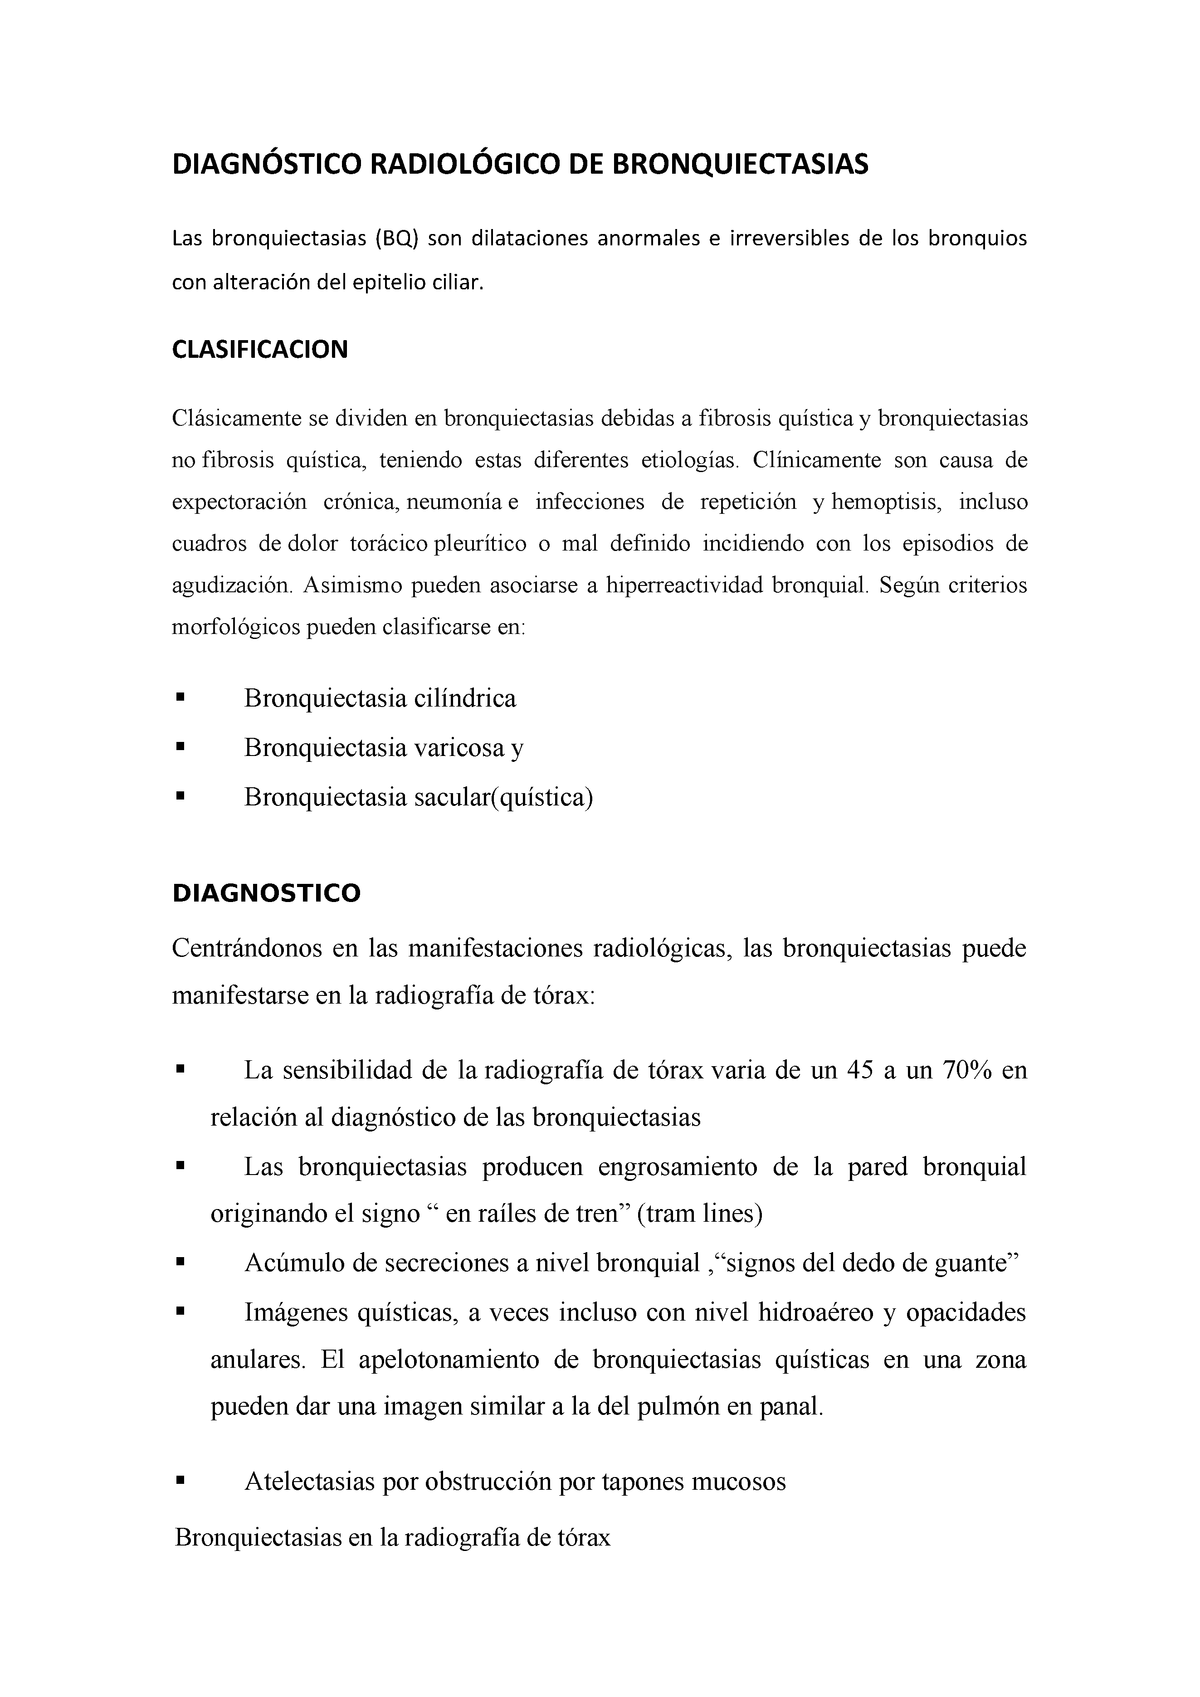 Quísticas bronquiectasias varicosas